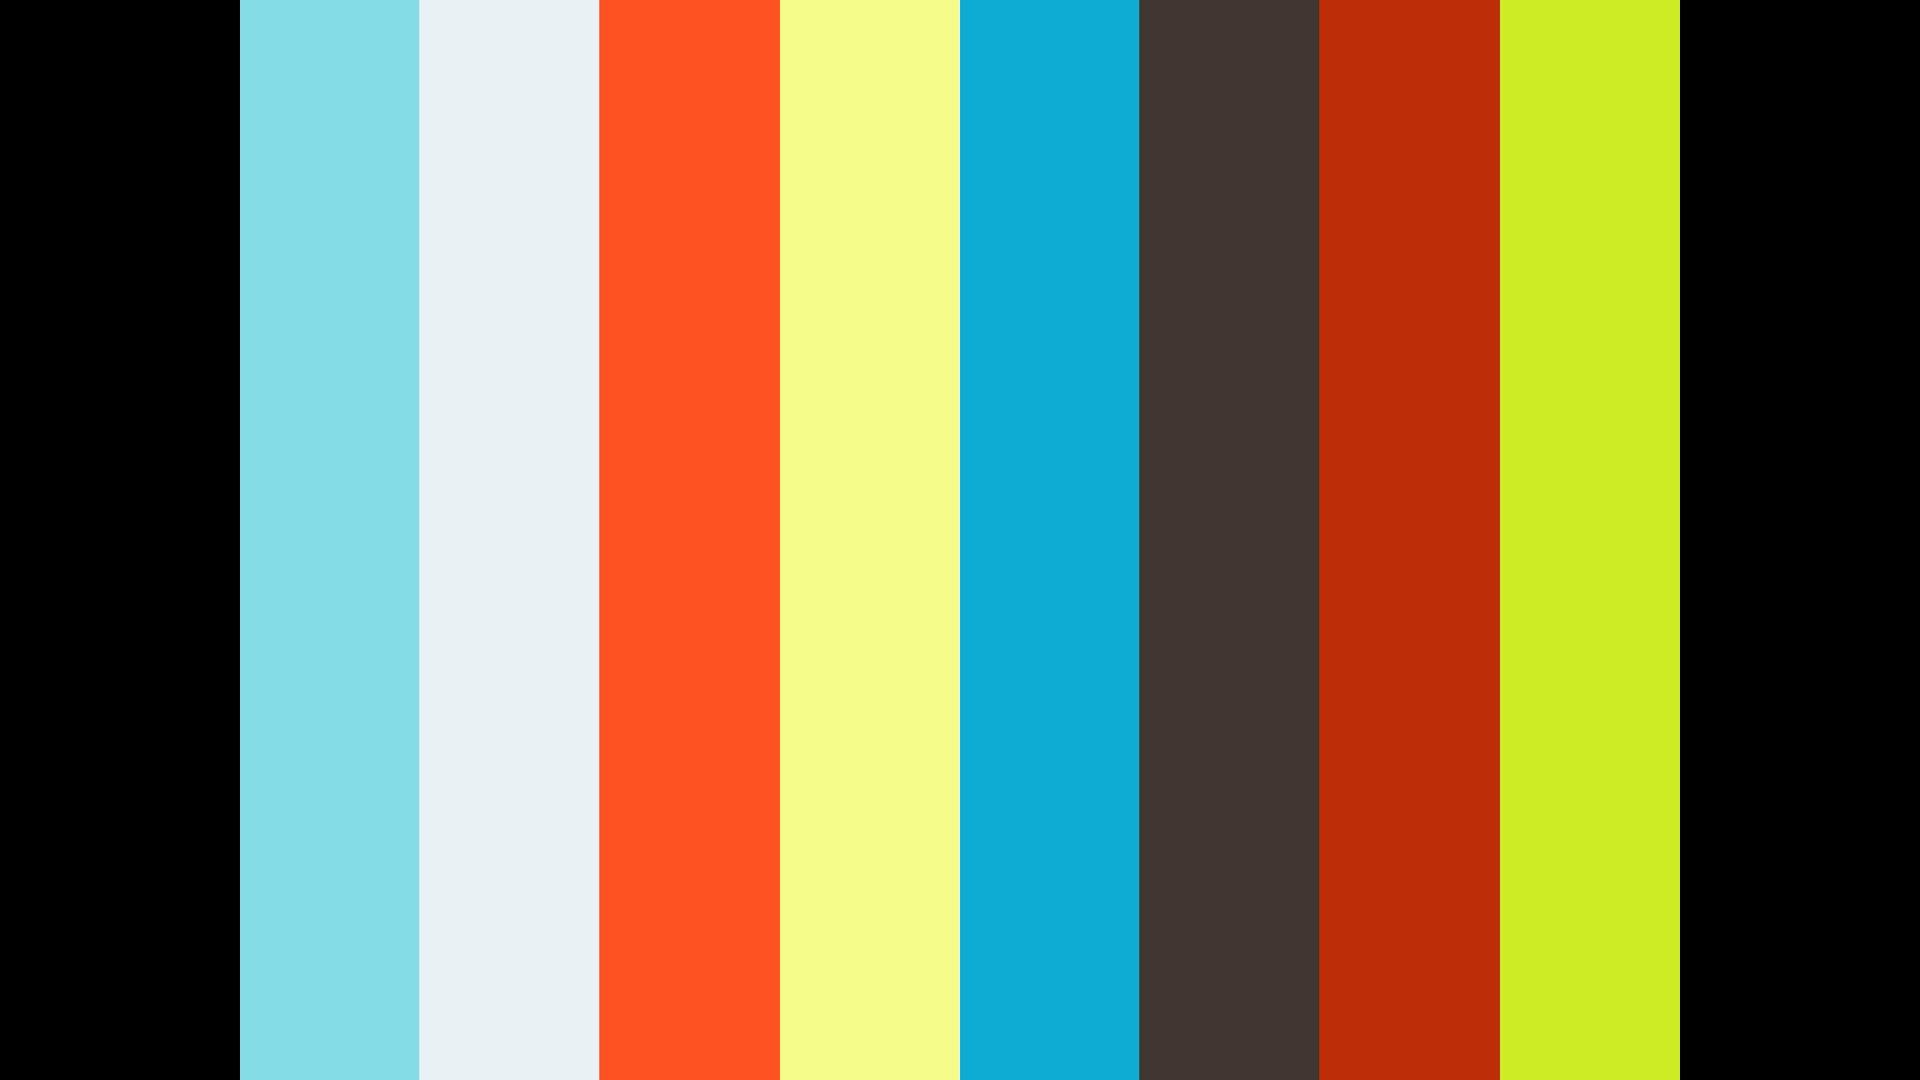 Carat - The new interface